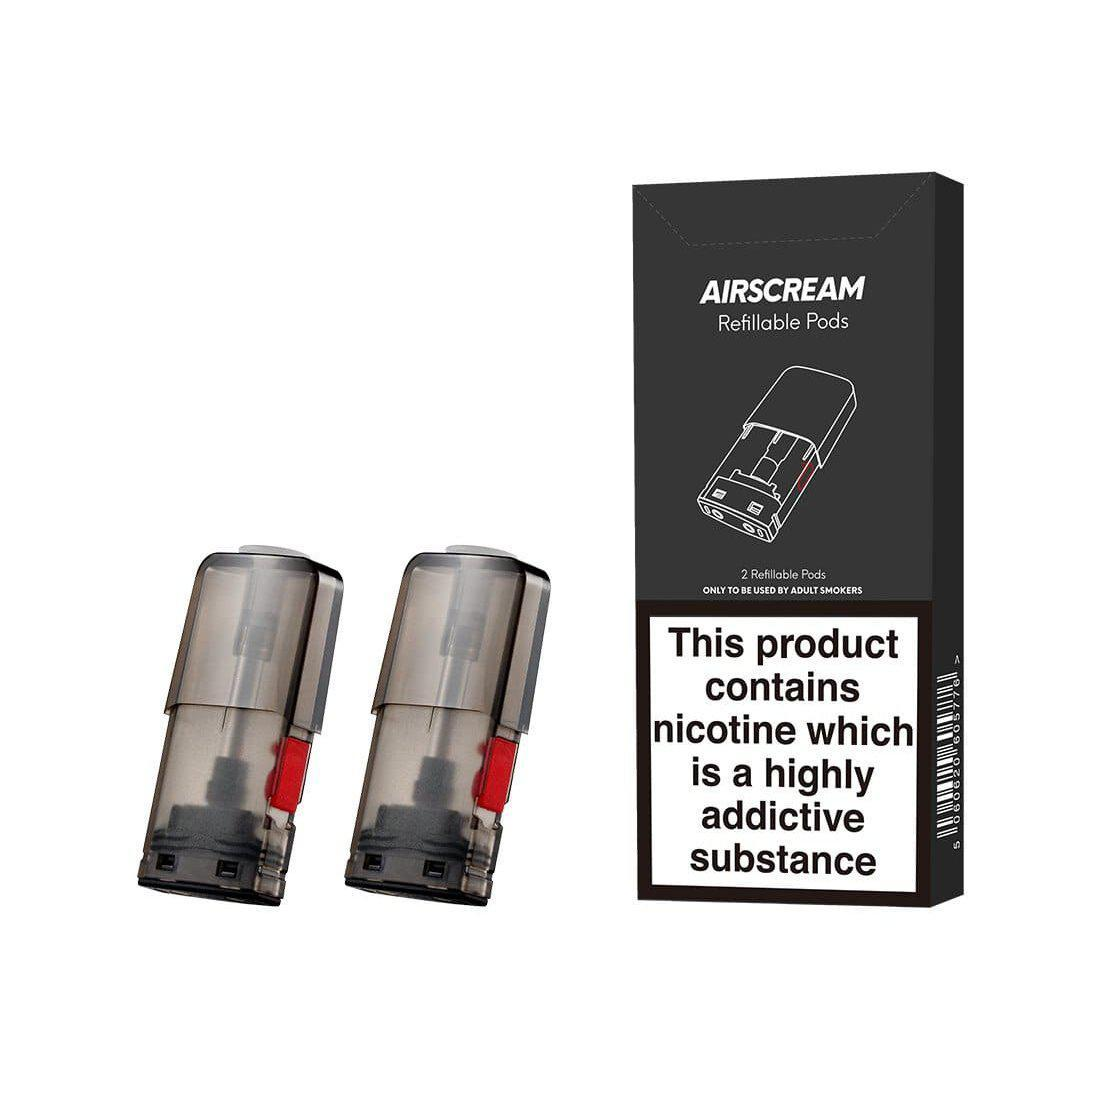 Airscream AirPops 7 Refillable Pods